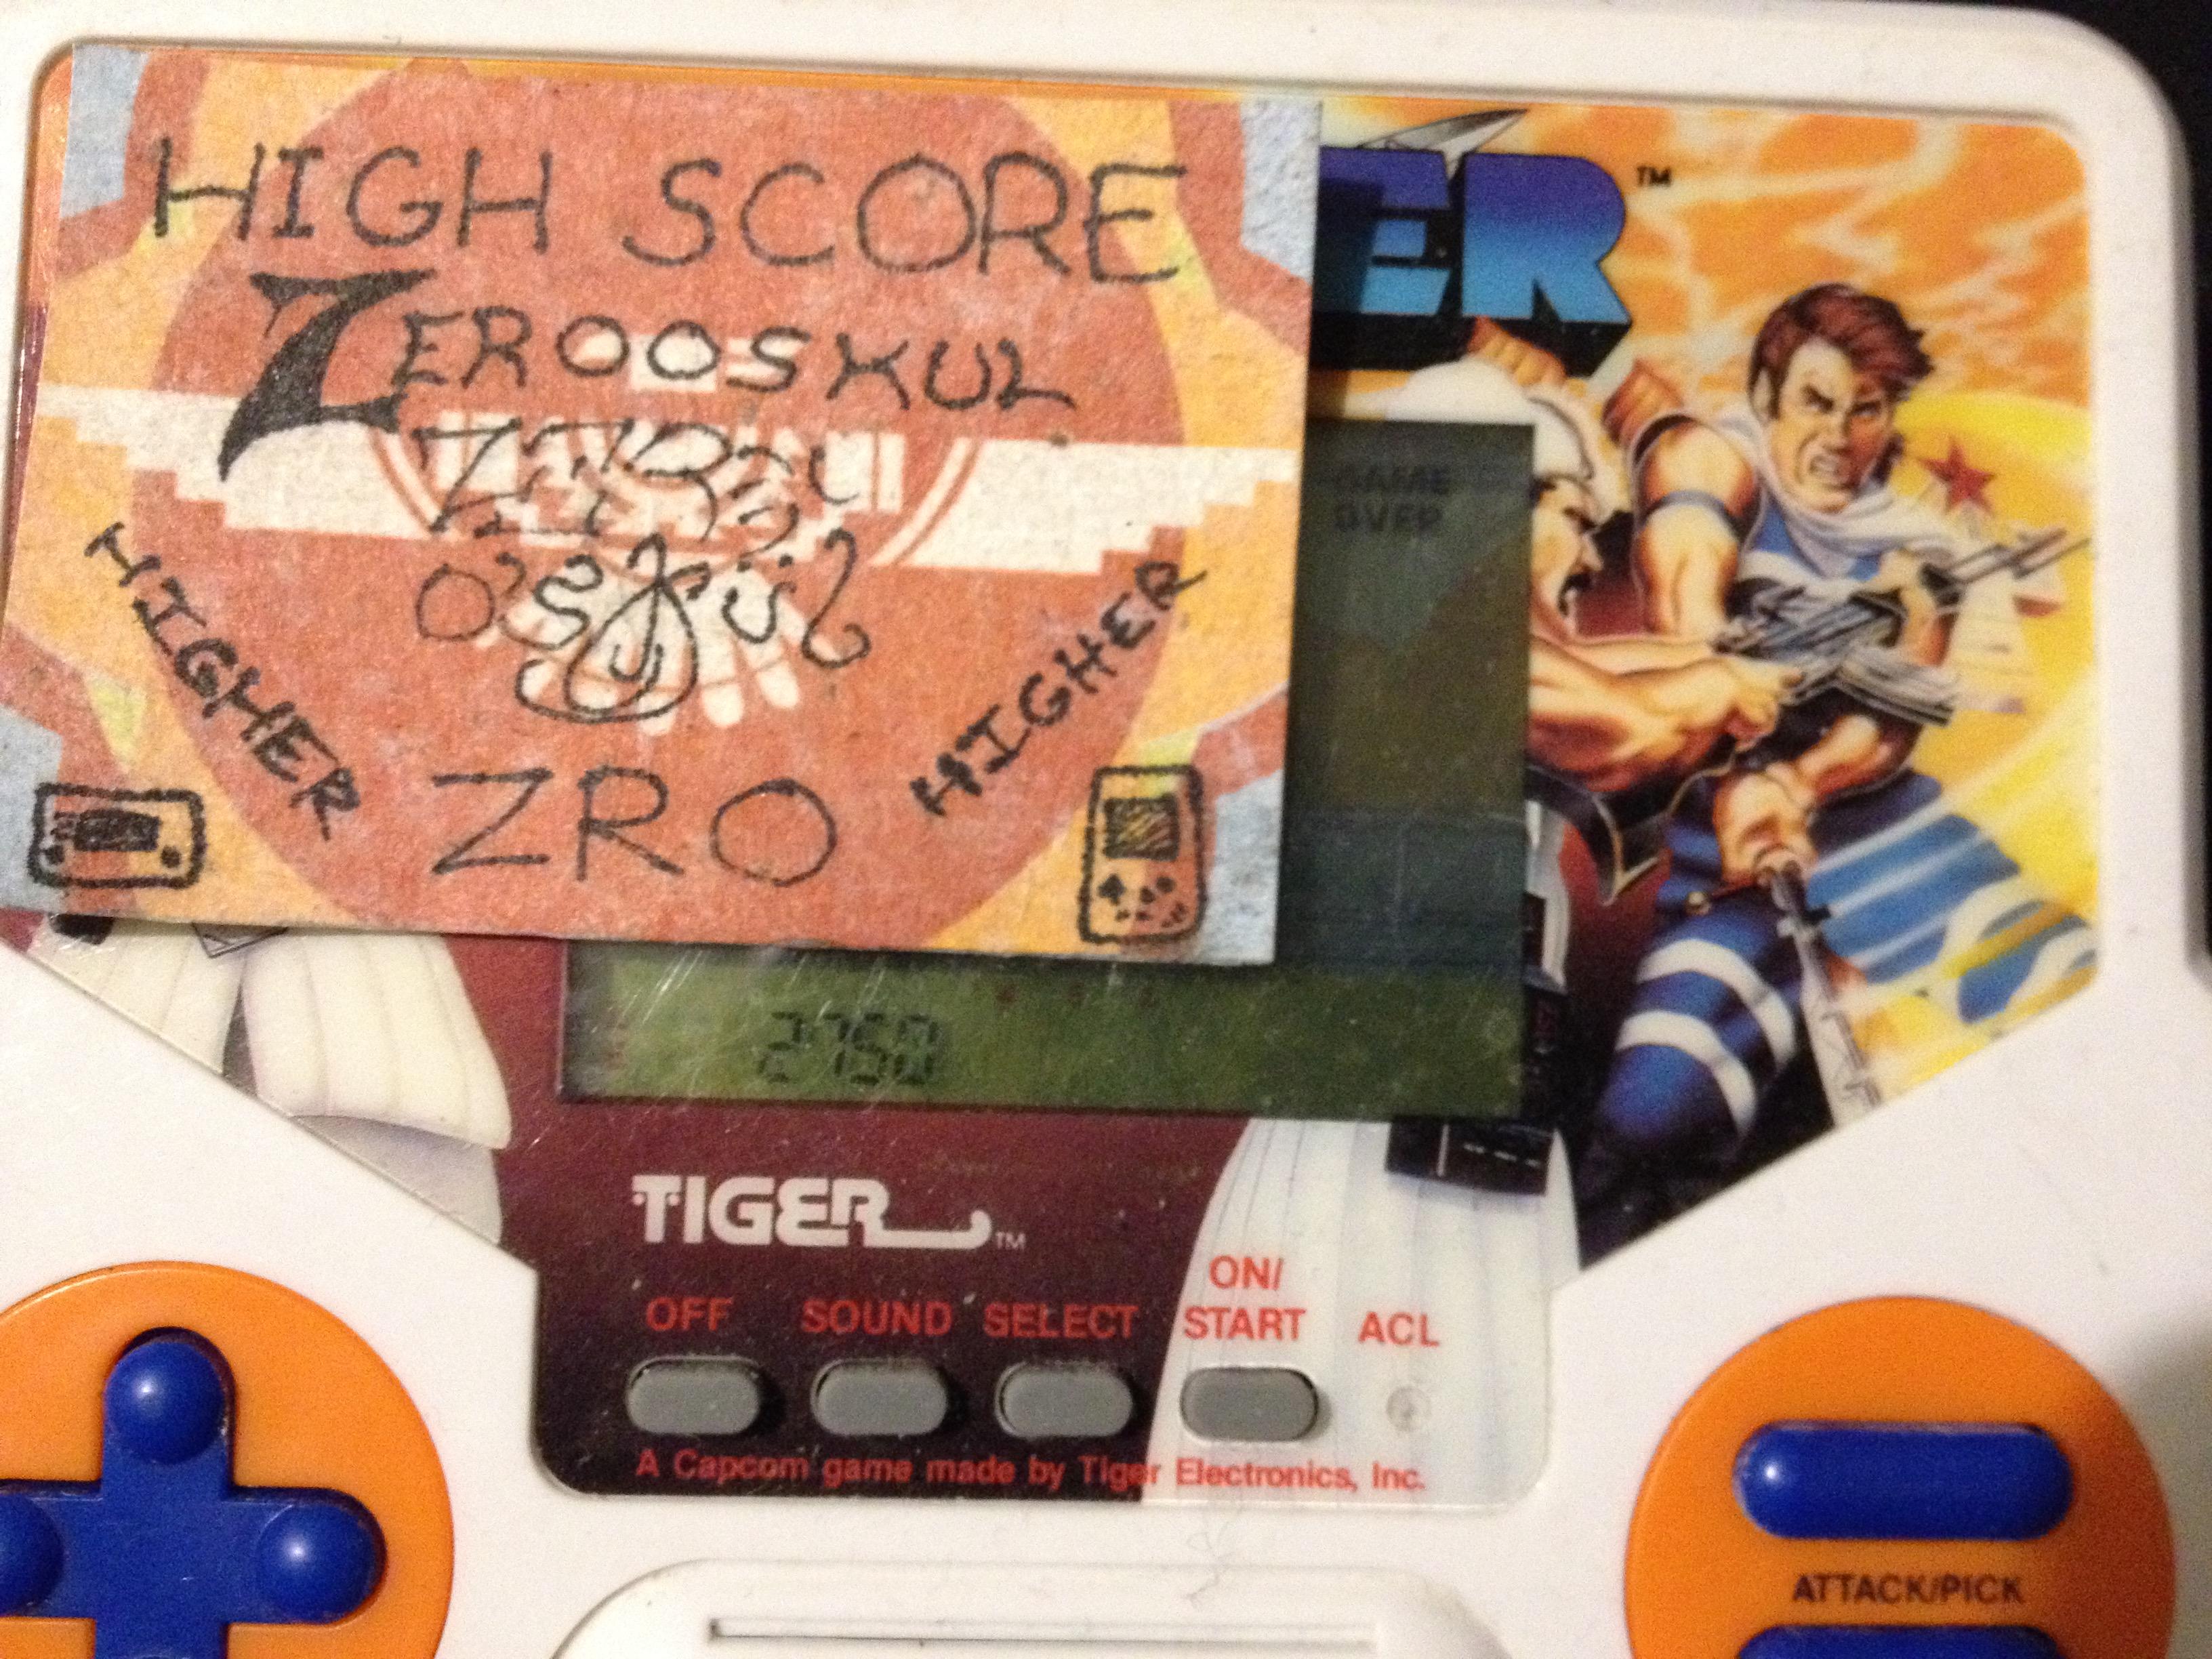 zerooskul: Tiger Electronics Strider (Dedicated Handheld) 2,750 points on 2019-12-17 01:37:30